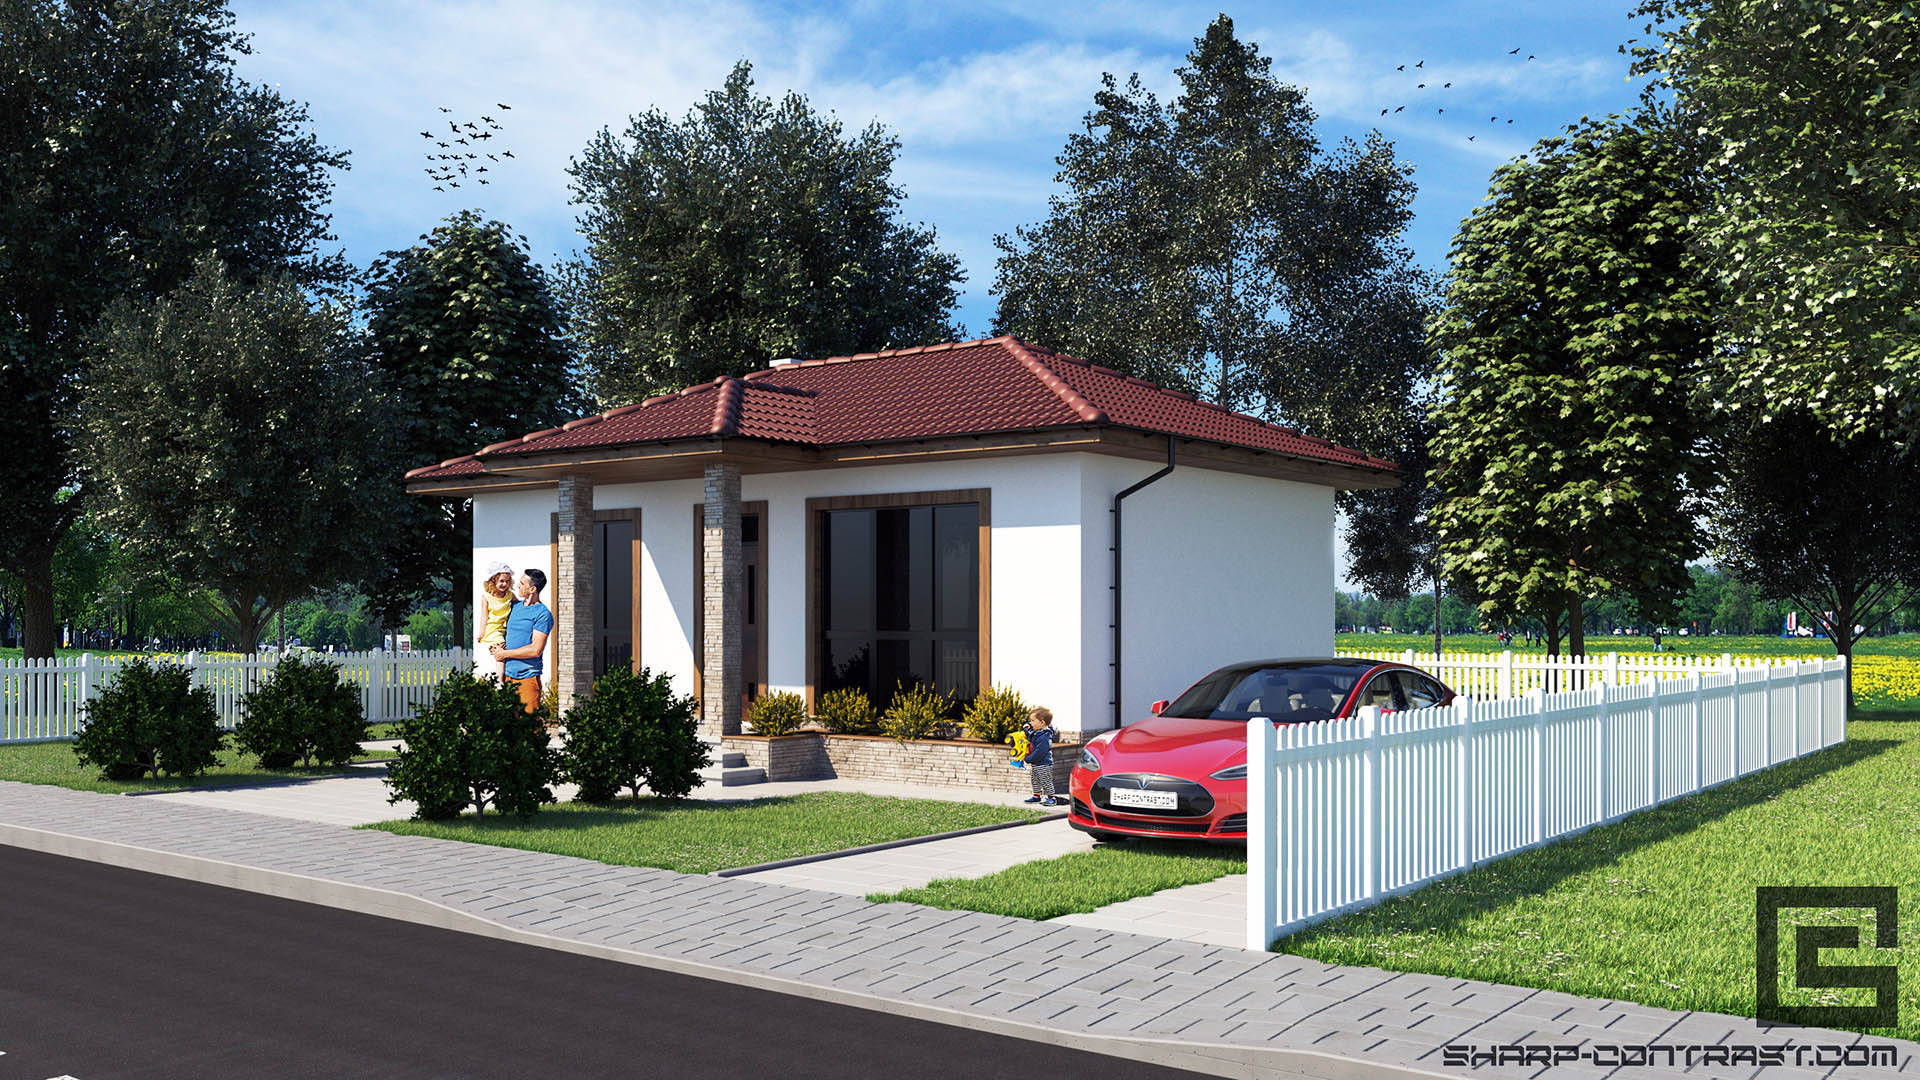 small-house-bungallow-krasimir-kapitanov-architect-sharp-contrast-design-residential-building